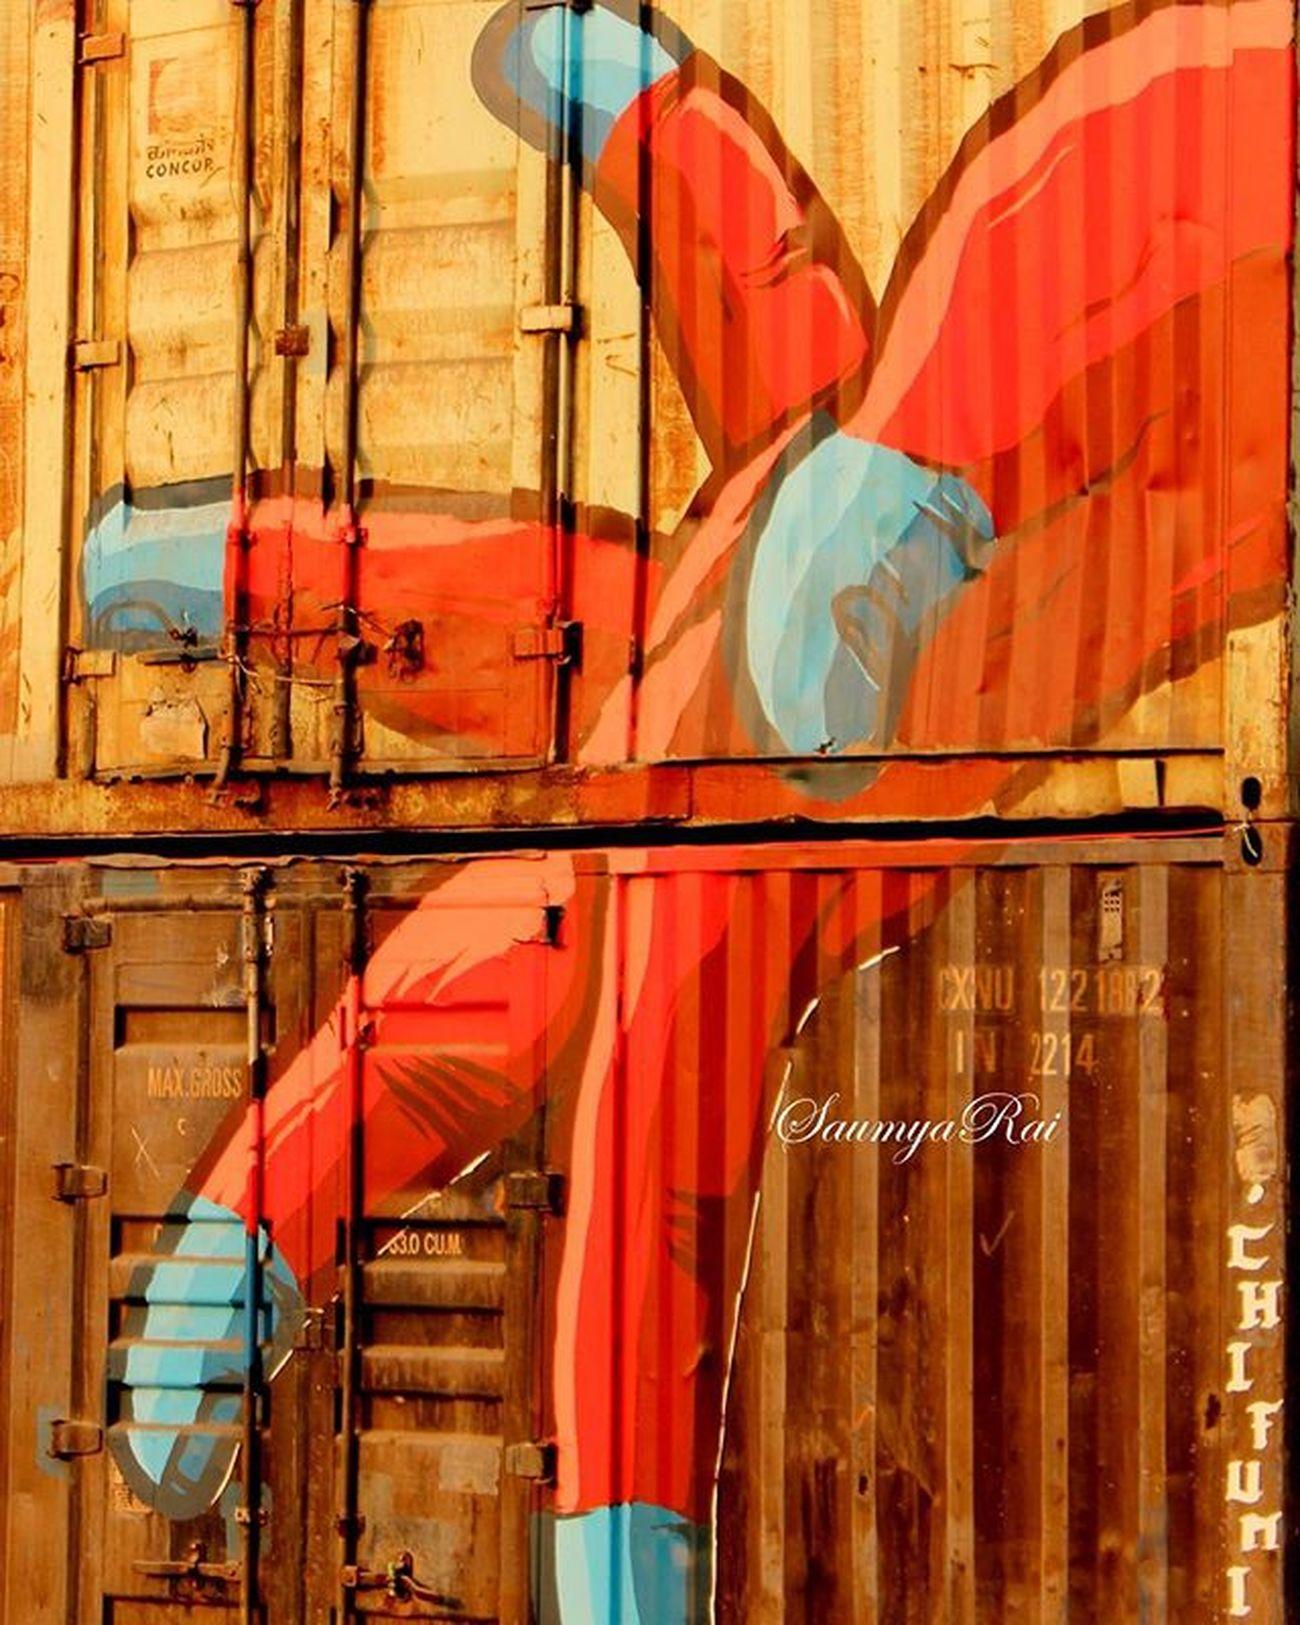 Khali haath aaye the hum🙌... khali haath jayege...🙋 Concoricdtkd Streetartfestival Streetart Hands Ruleoflife Startindia2016 Wip Streetart Delhi Mural Instagraffiti Art Sprayart Inspiration _soi _indiasb Mypixeldiary Forlocalinsider Travelfire Storiesofindia Indiaclicks Click_india_click Igramming_india Vscoindia Vscodelhi dfordelhi instadelhi